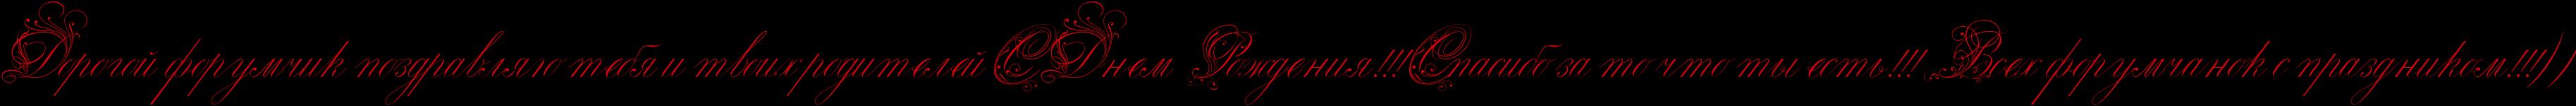 http://x-lines.ru/letters/i/cyrillicscript/0370/d8030a/60/1/4nkpbxstodem7wfu4n9pbqjy4gnpbxstodea8wfh4gd7bqgozeopbx6oz5emxwfw4gypbcgosmemzwcx4g8nbwcn4n47bcqtthopbqby4gbpbcsoz5emtwcfrdeabwf64n4pbqgtomemmwf54n47bqjy4no1bwrw4n67bpqozoopbegoz5empwfw4n47bxqozdea6ejbrropbeqoz9embwcb4nhpbcqozaopbp6osyopdysozaopdb6tomemhegtomeasegoszeadwcn4ggnnejbrdejfwcb4n47dbjy4gnpbxstodea8wfh4gd7bcgozzem7wf4rdeanegoz9eabwfo4n57bpgozzemtwf44n9pbxbbrro11ke.png